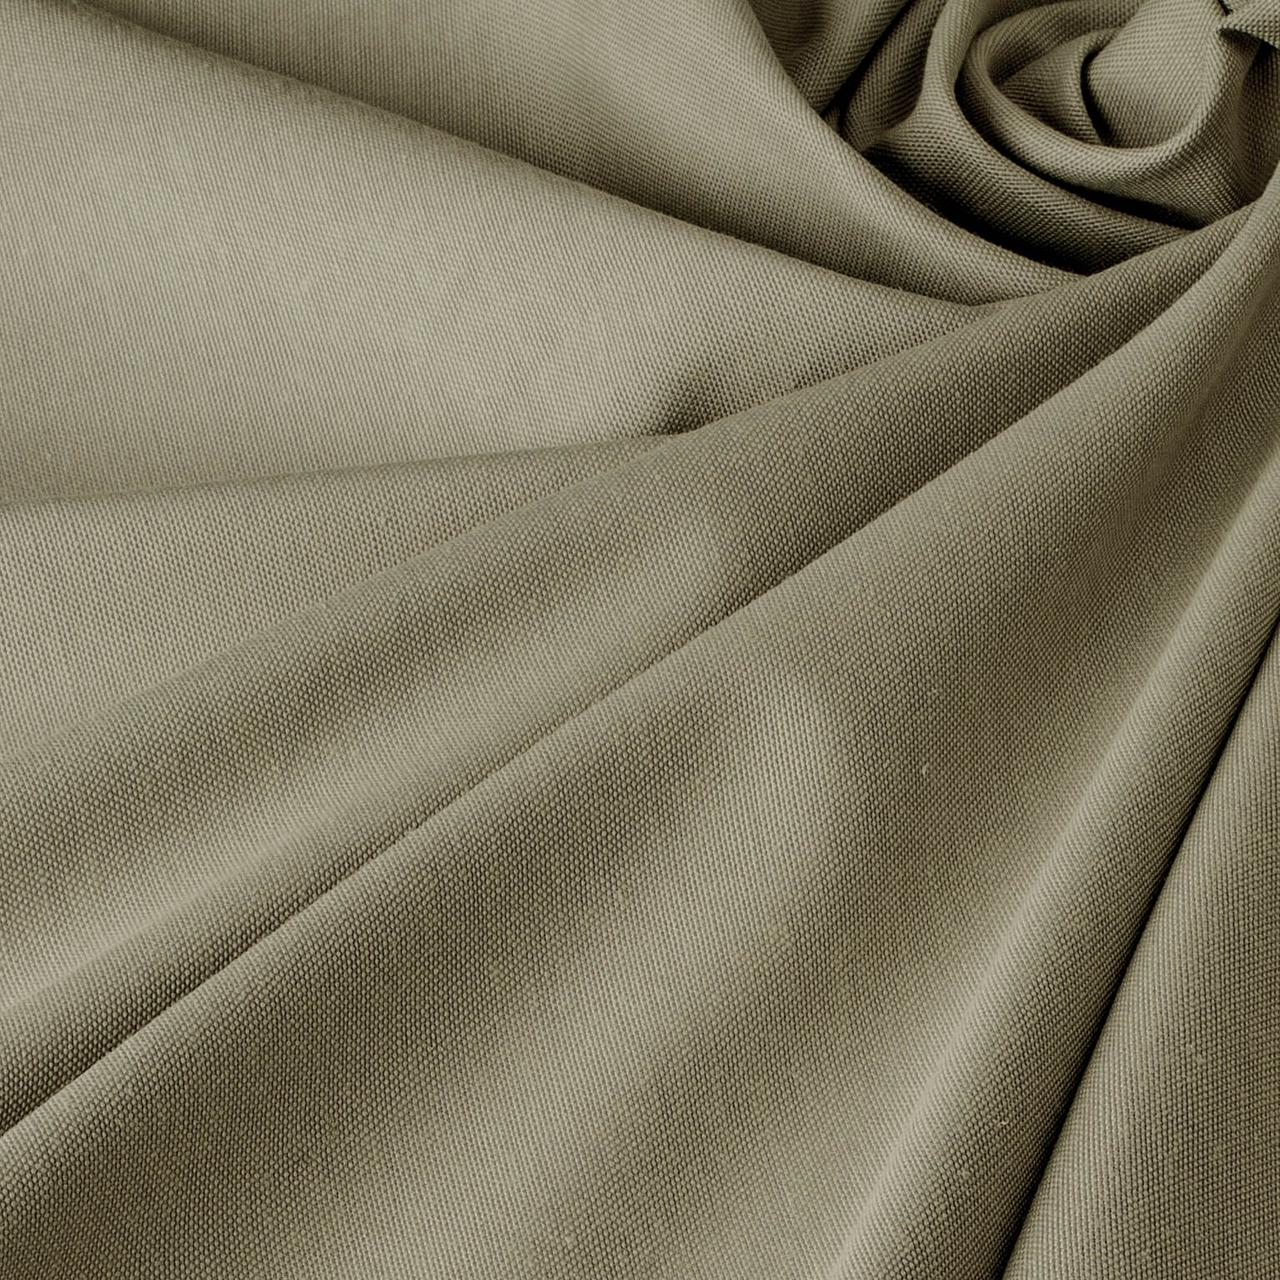 Ткань для штор и скатертей Teflon 81192